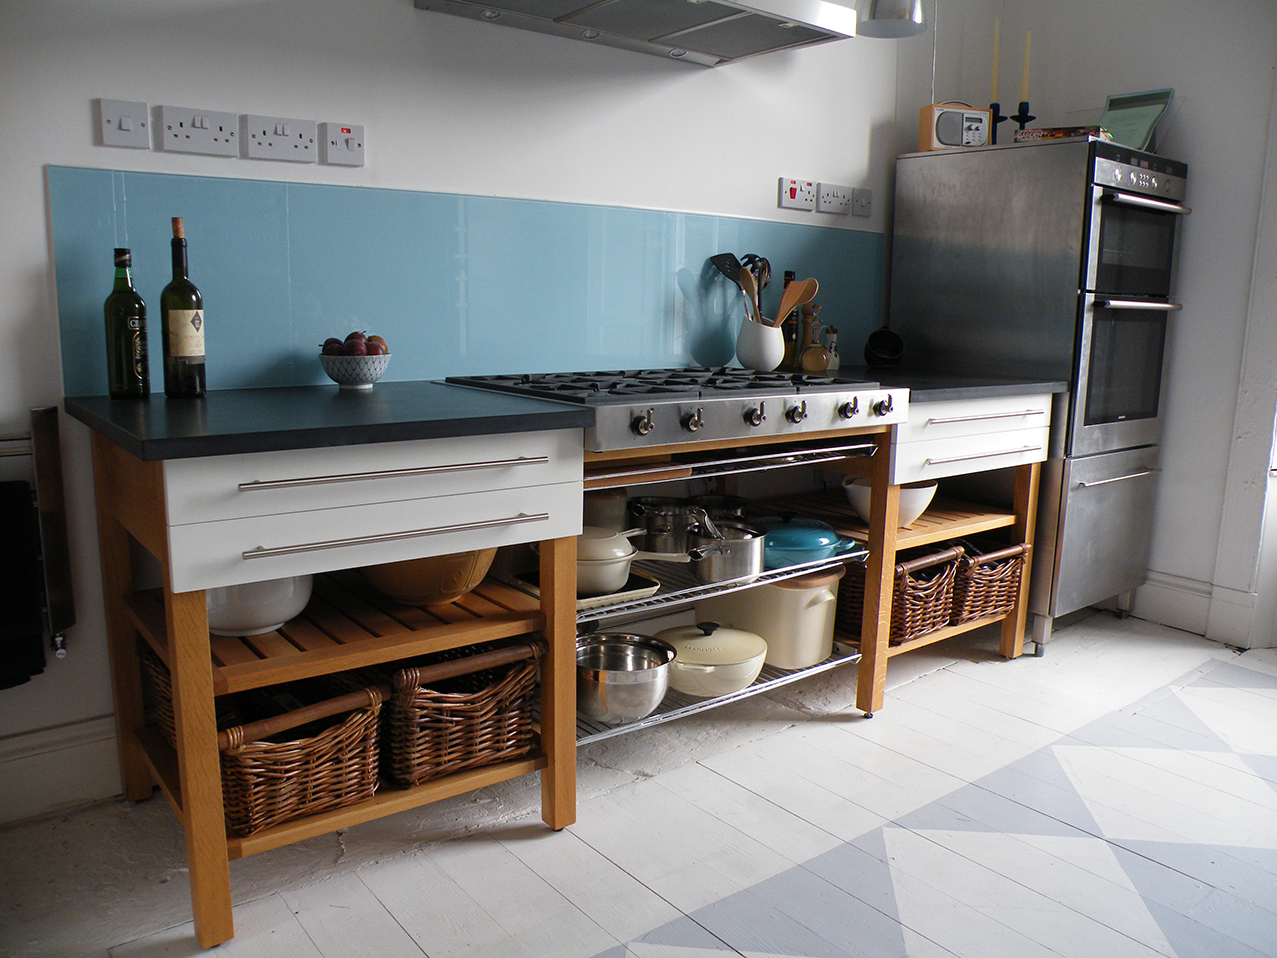 free standing kitchens non skid kitchen rugs diggin furniture edinburgh freestanding 2